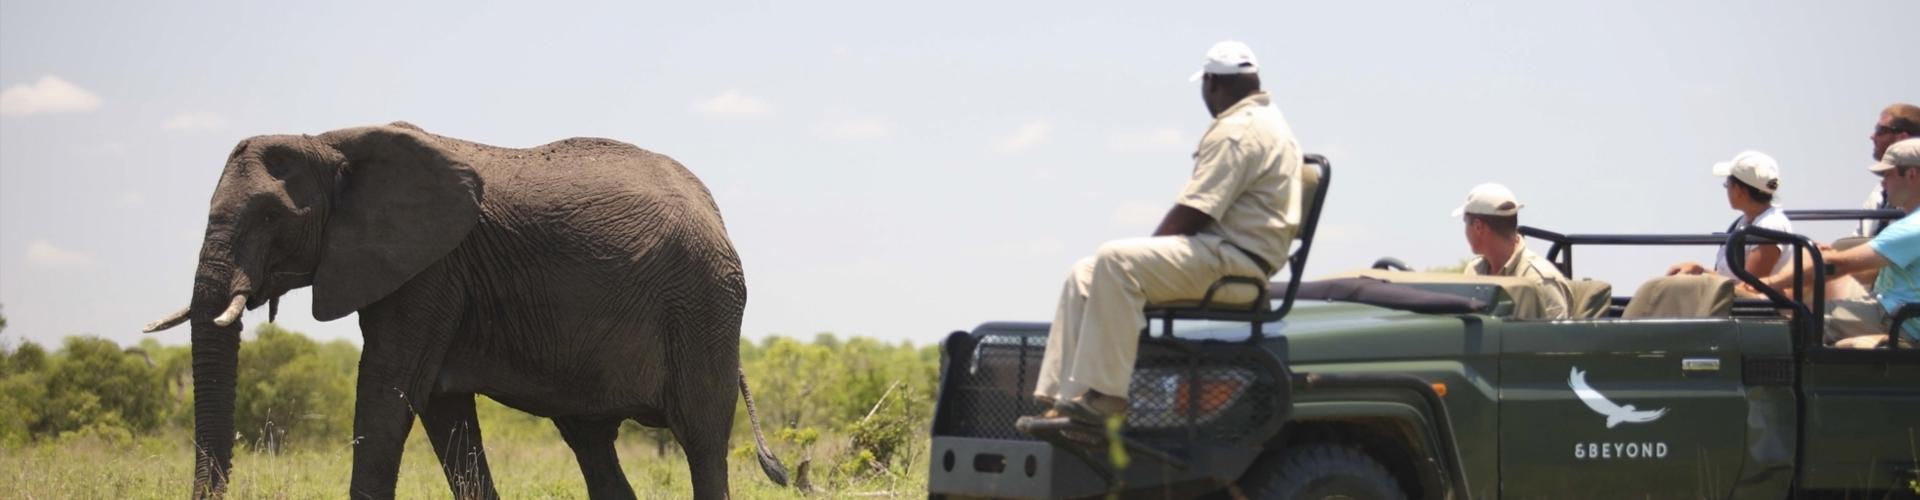 header-ngala-game-reserve-safari-zuid-afrika-1920x500-1